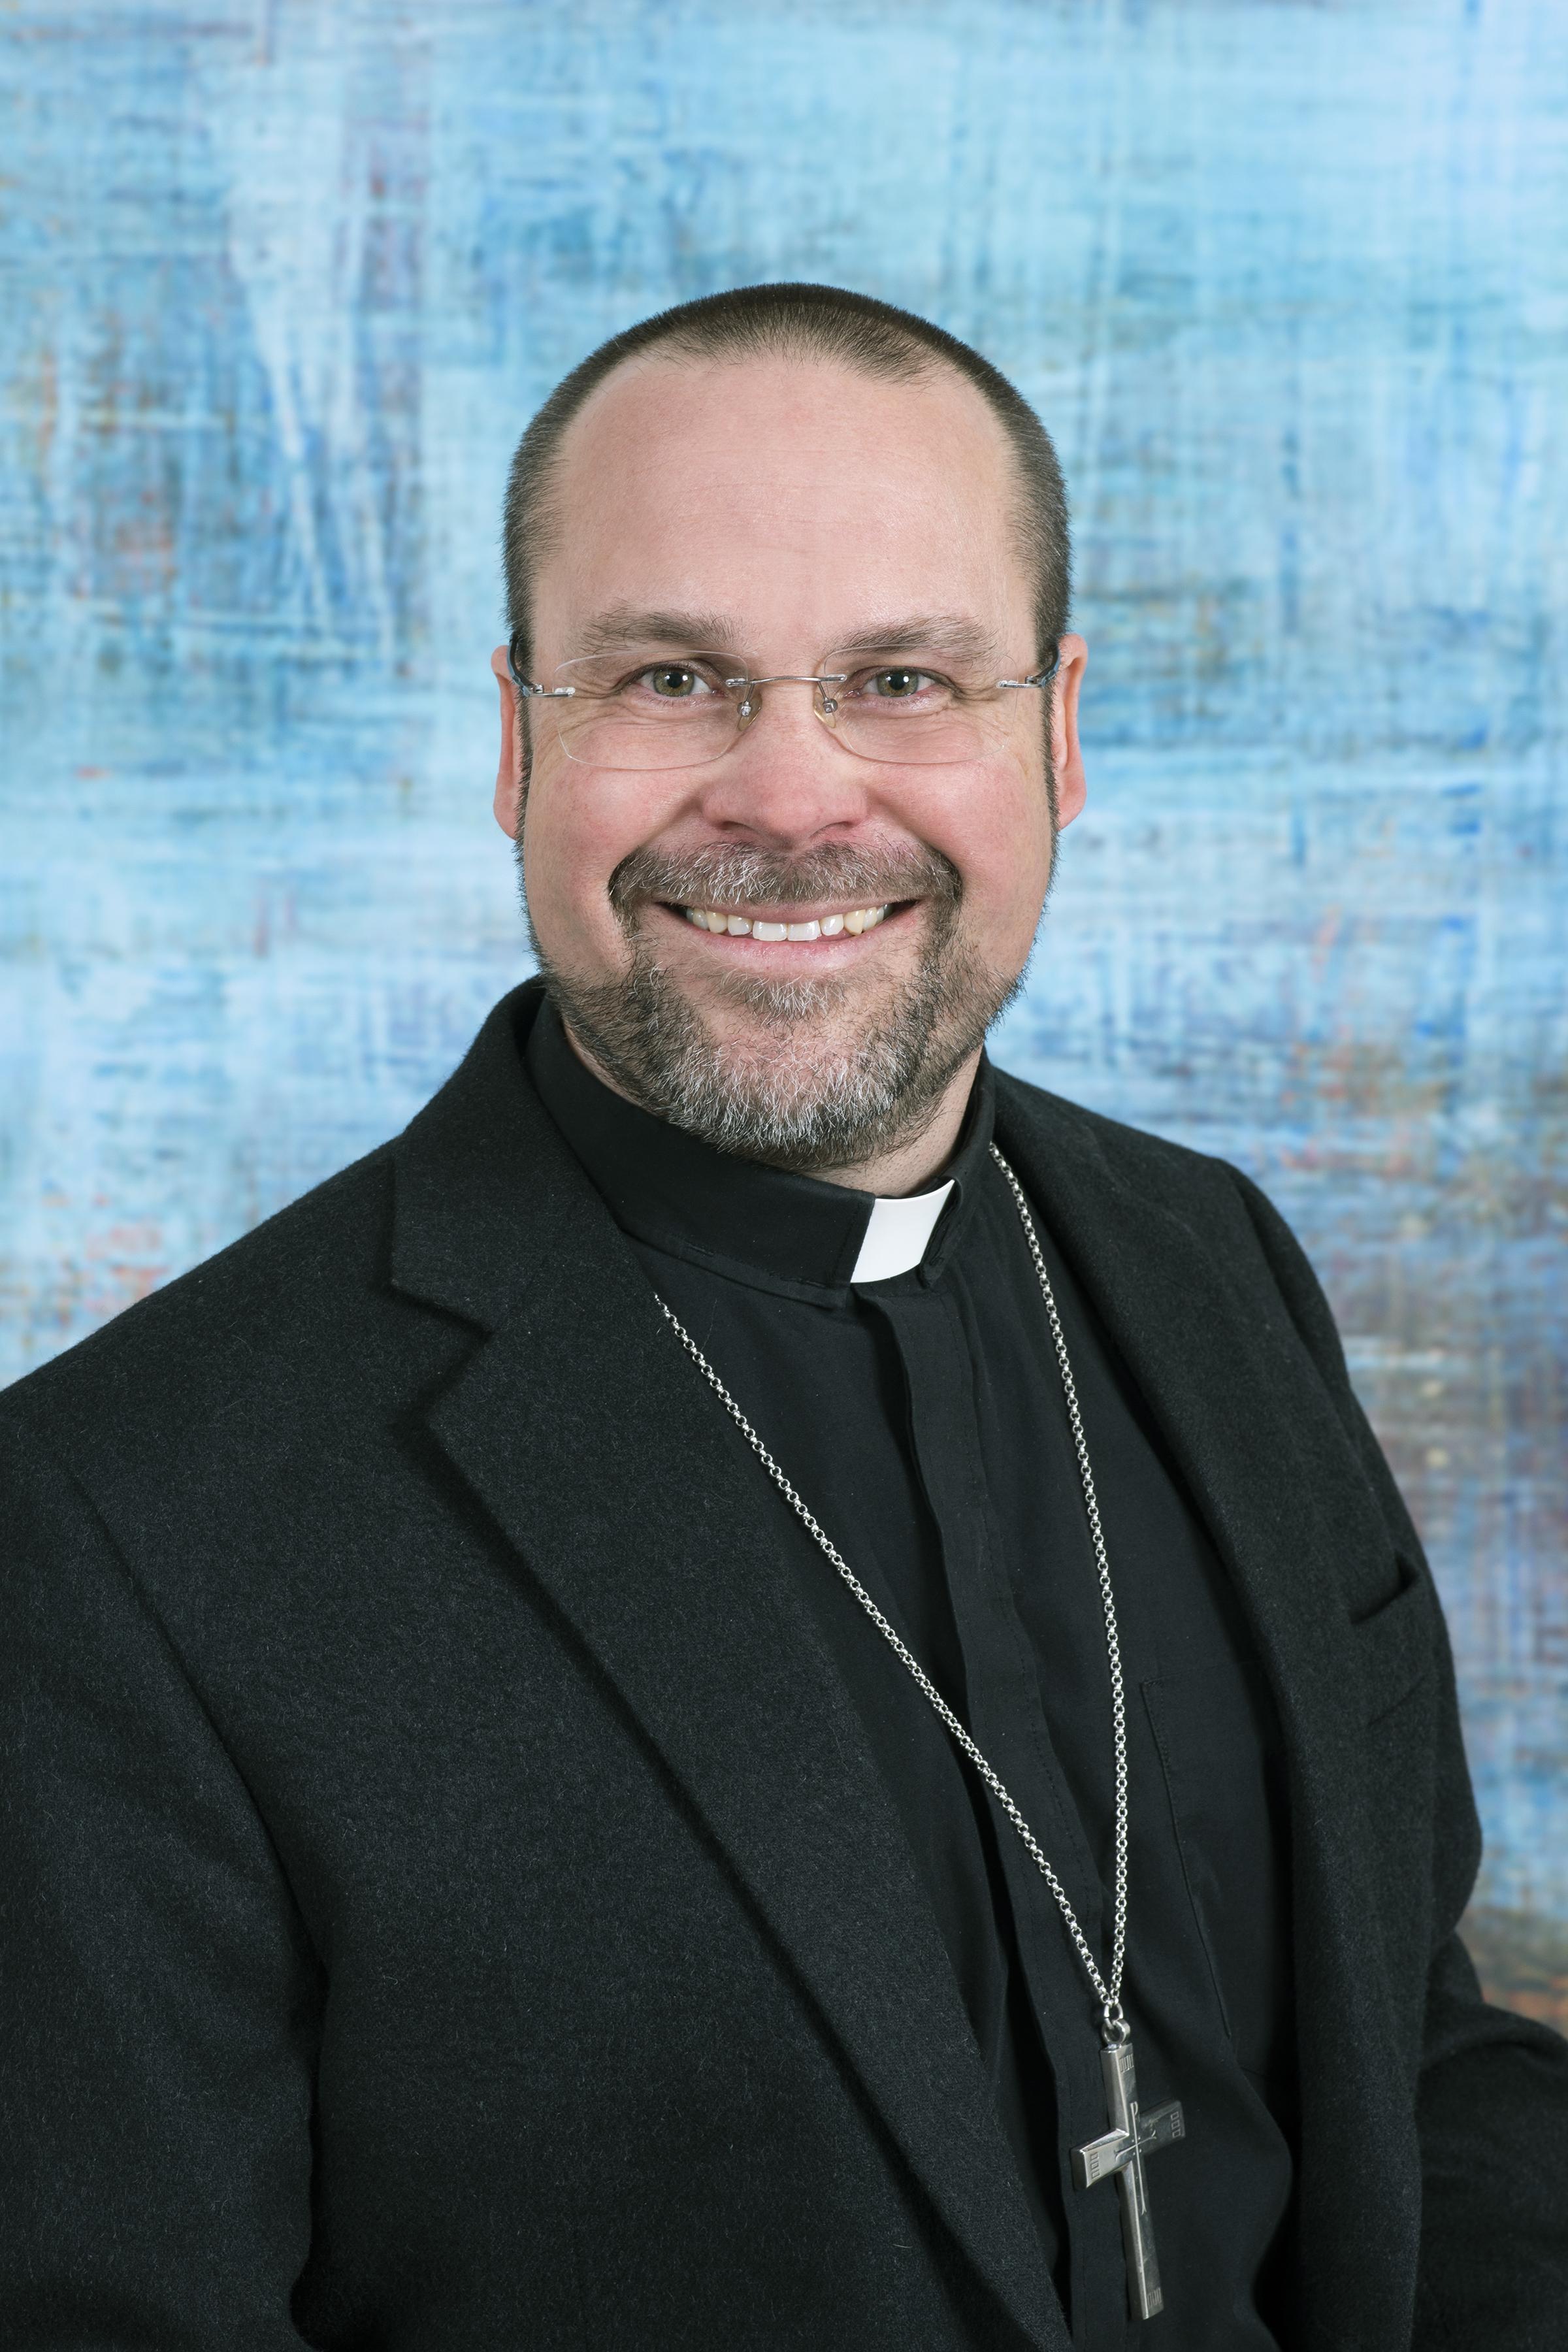 Pastor Gordon Camp